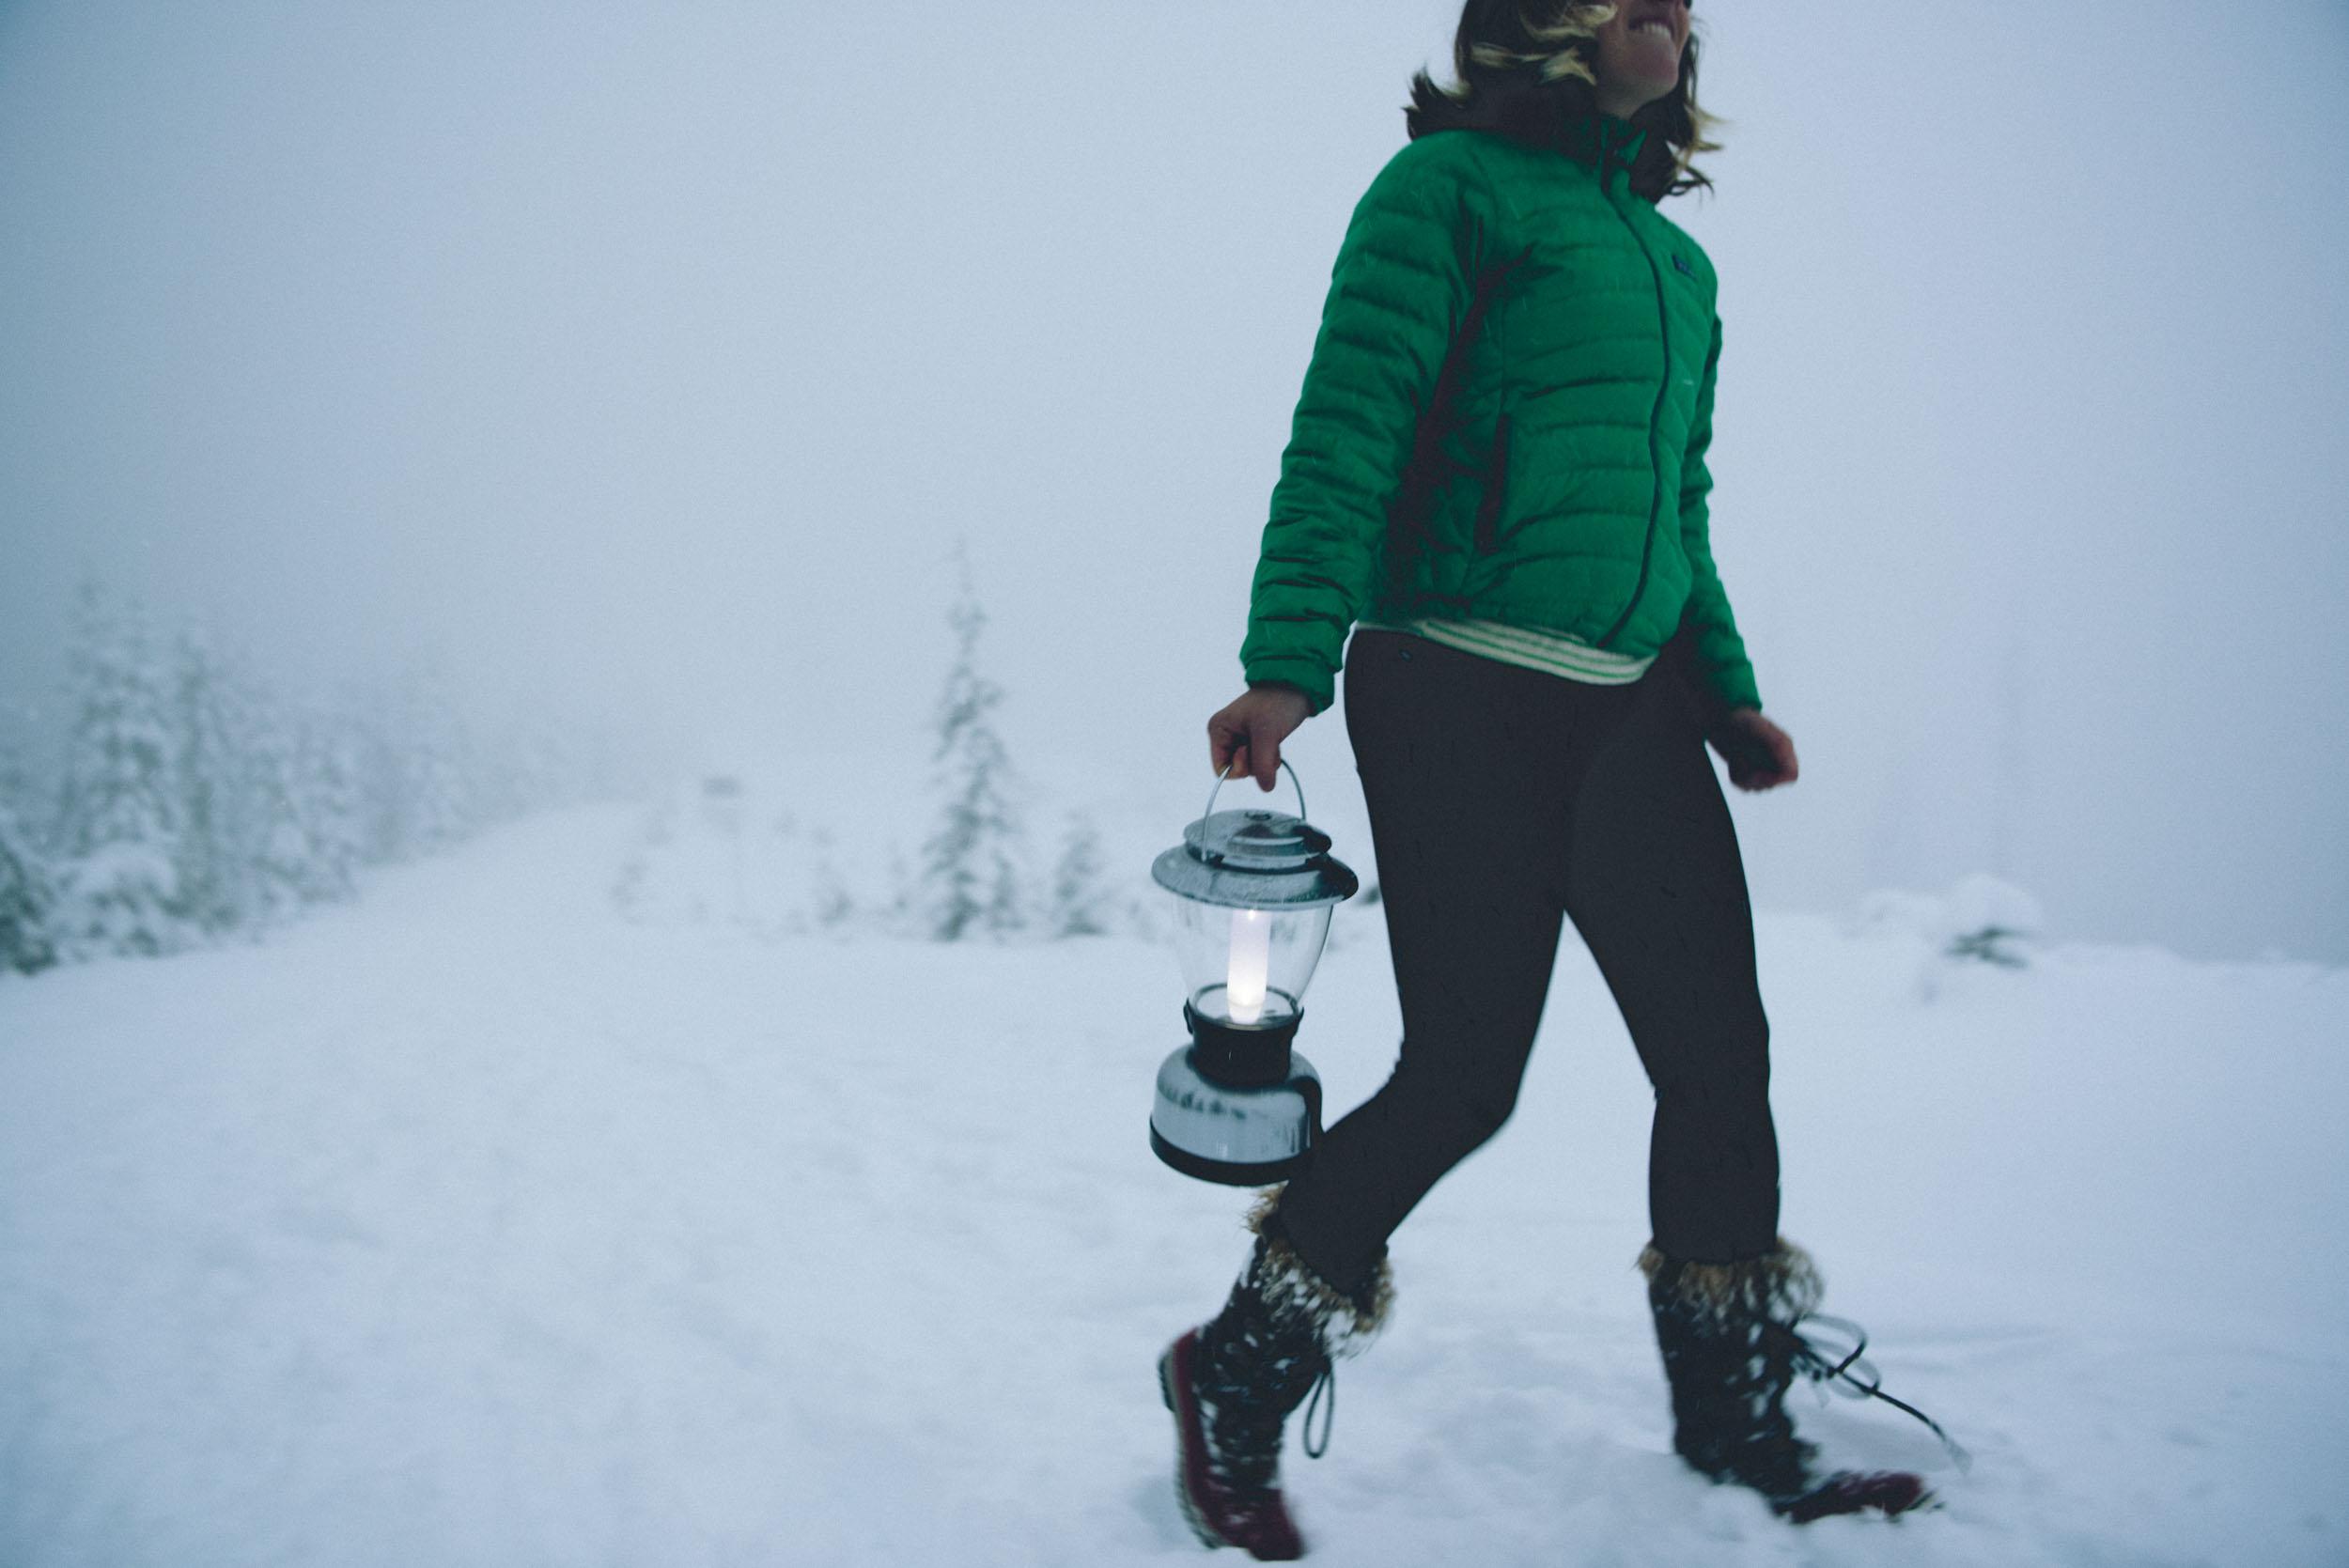 Miriam-Subbiah-Snow-Bowl-Hut-14.jpg